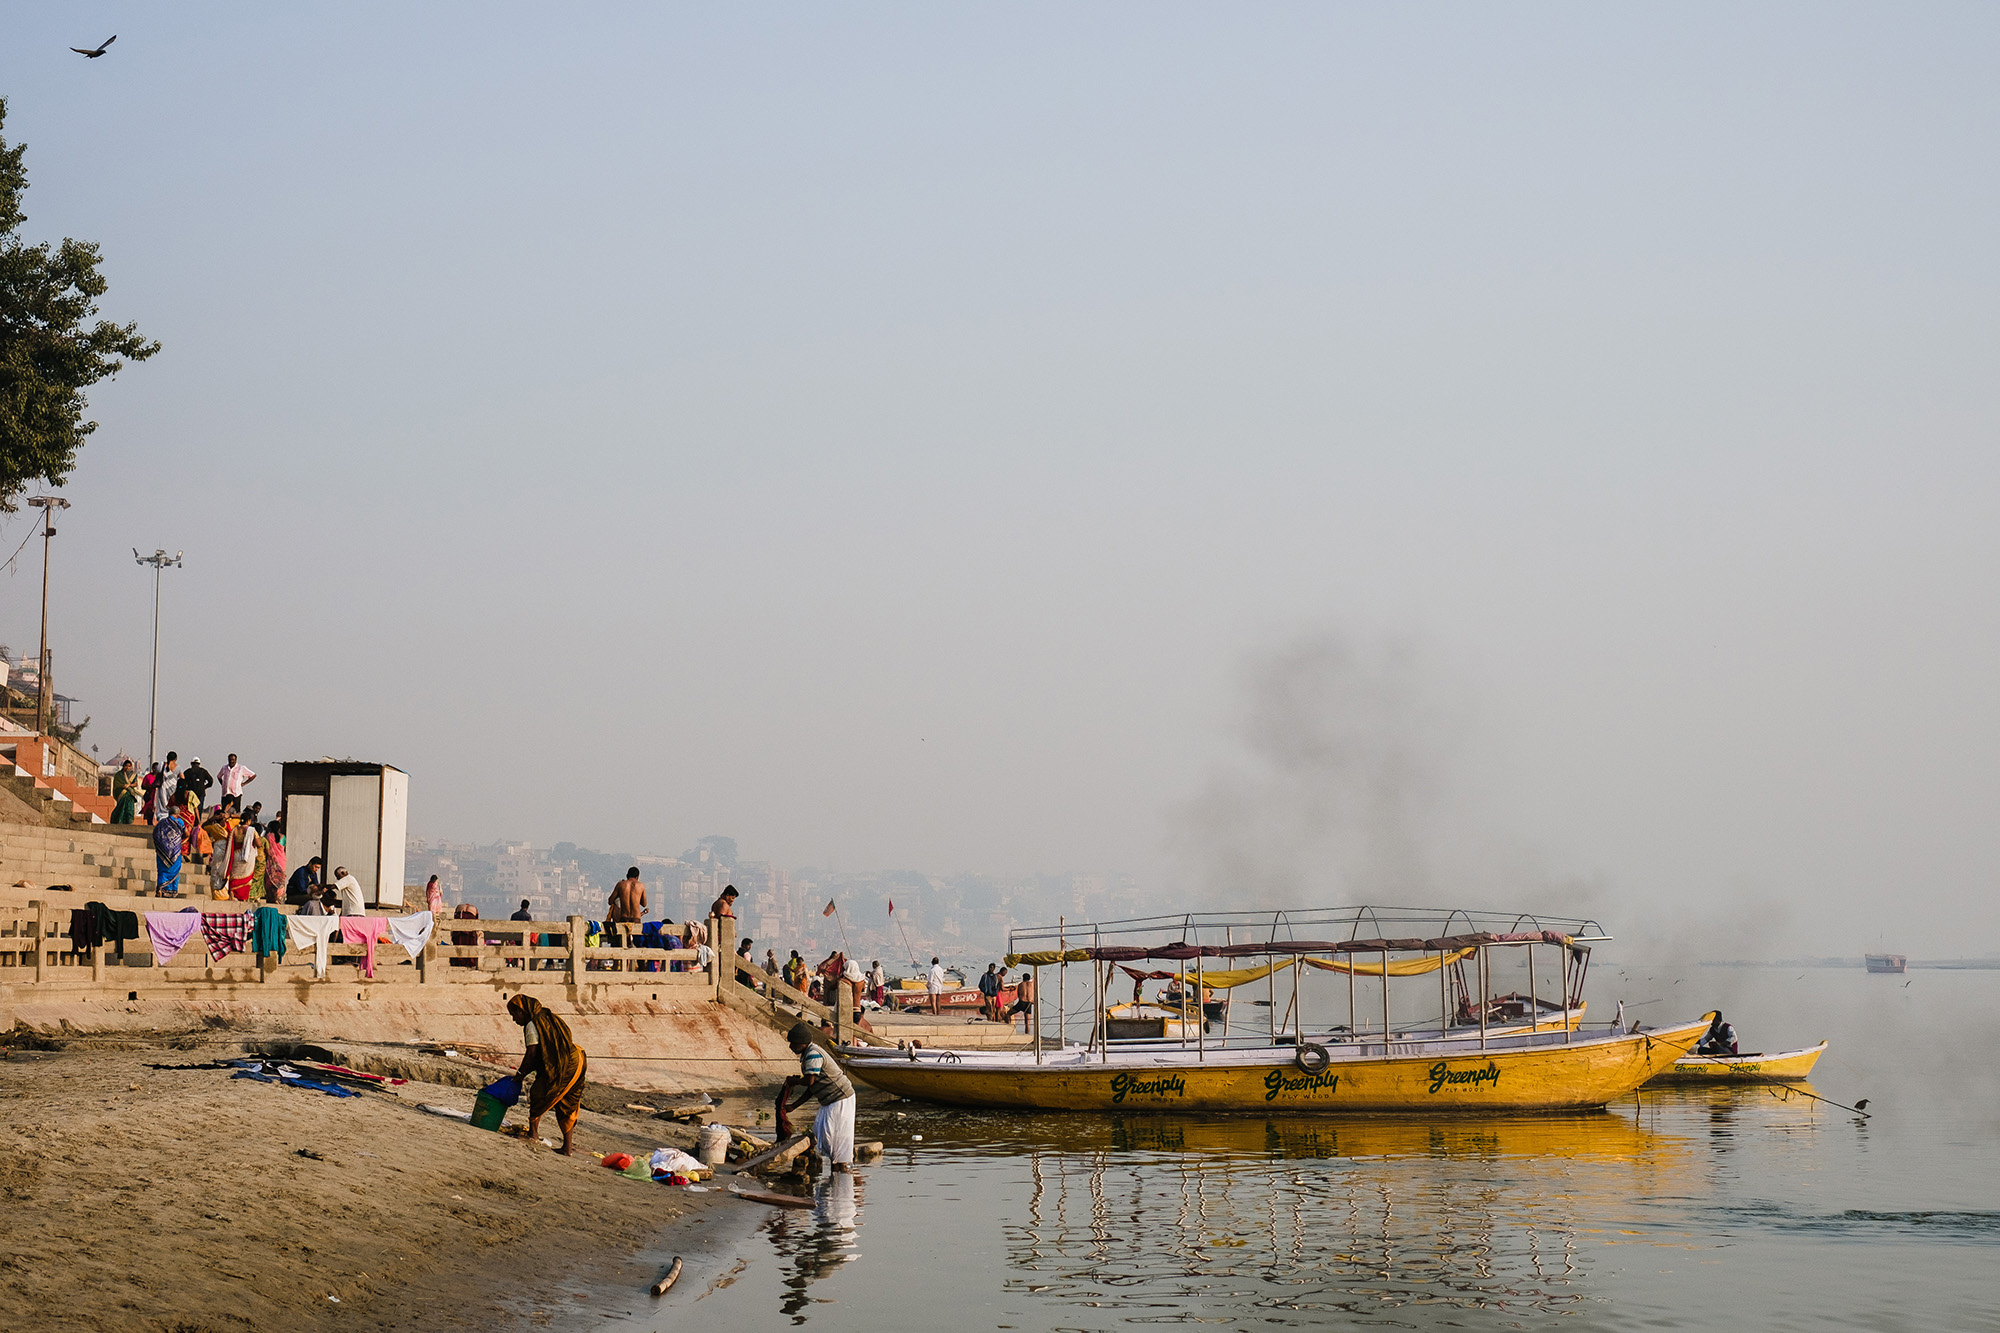 AnjaPoehlmann_India-Varanasi_115.jpg